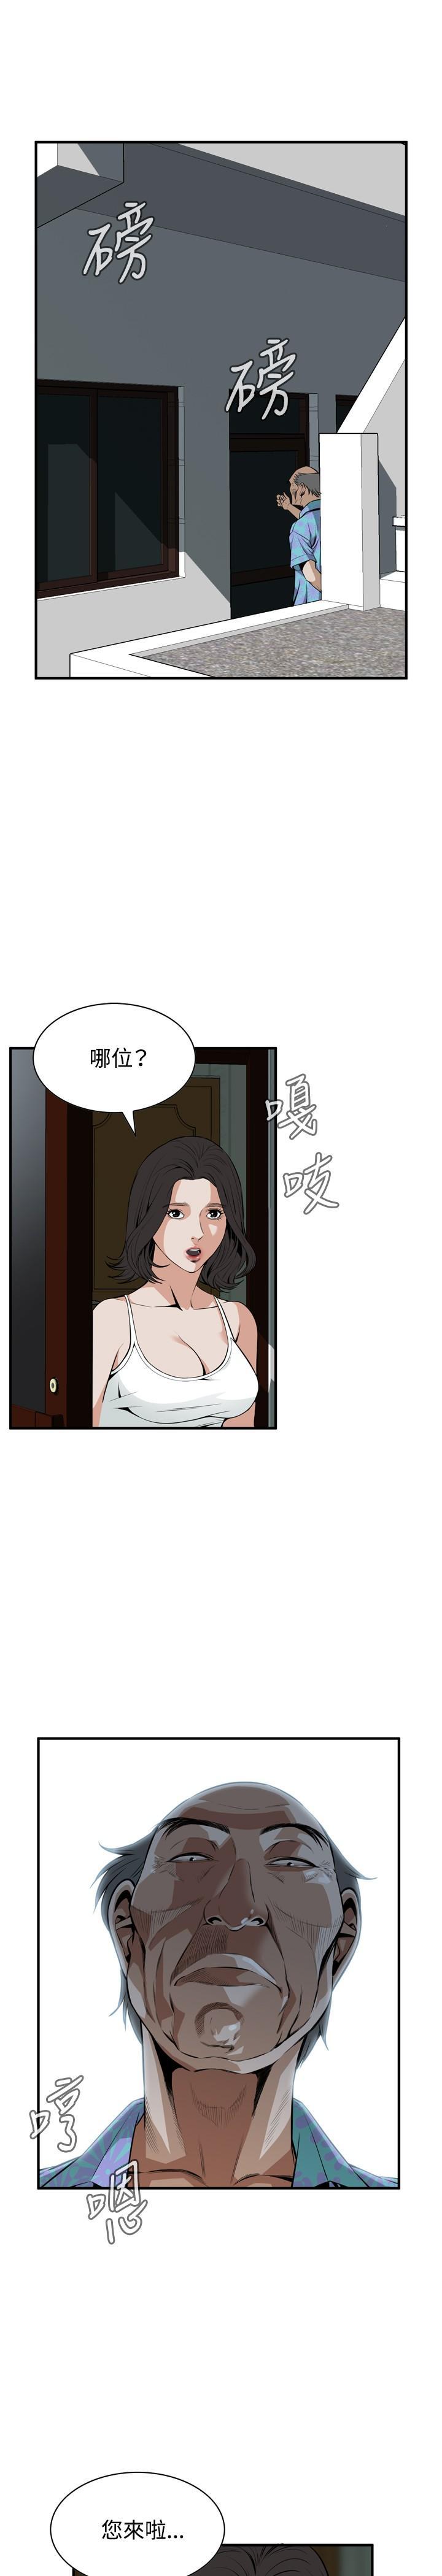 Take a Peek 偷窥 Ch.39~51 [Chinese]中文 113